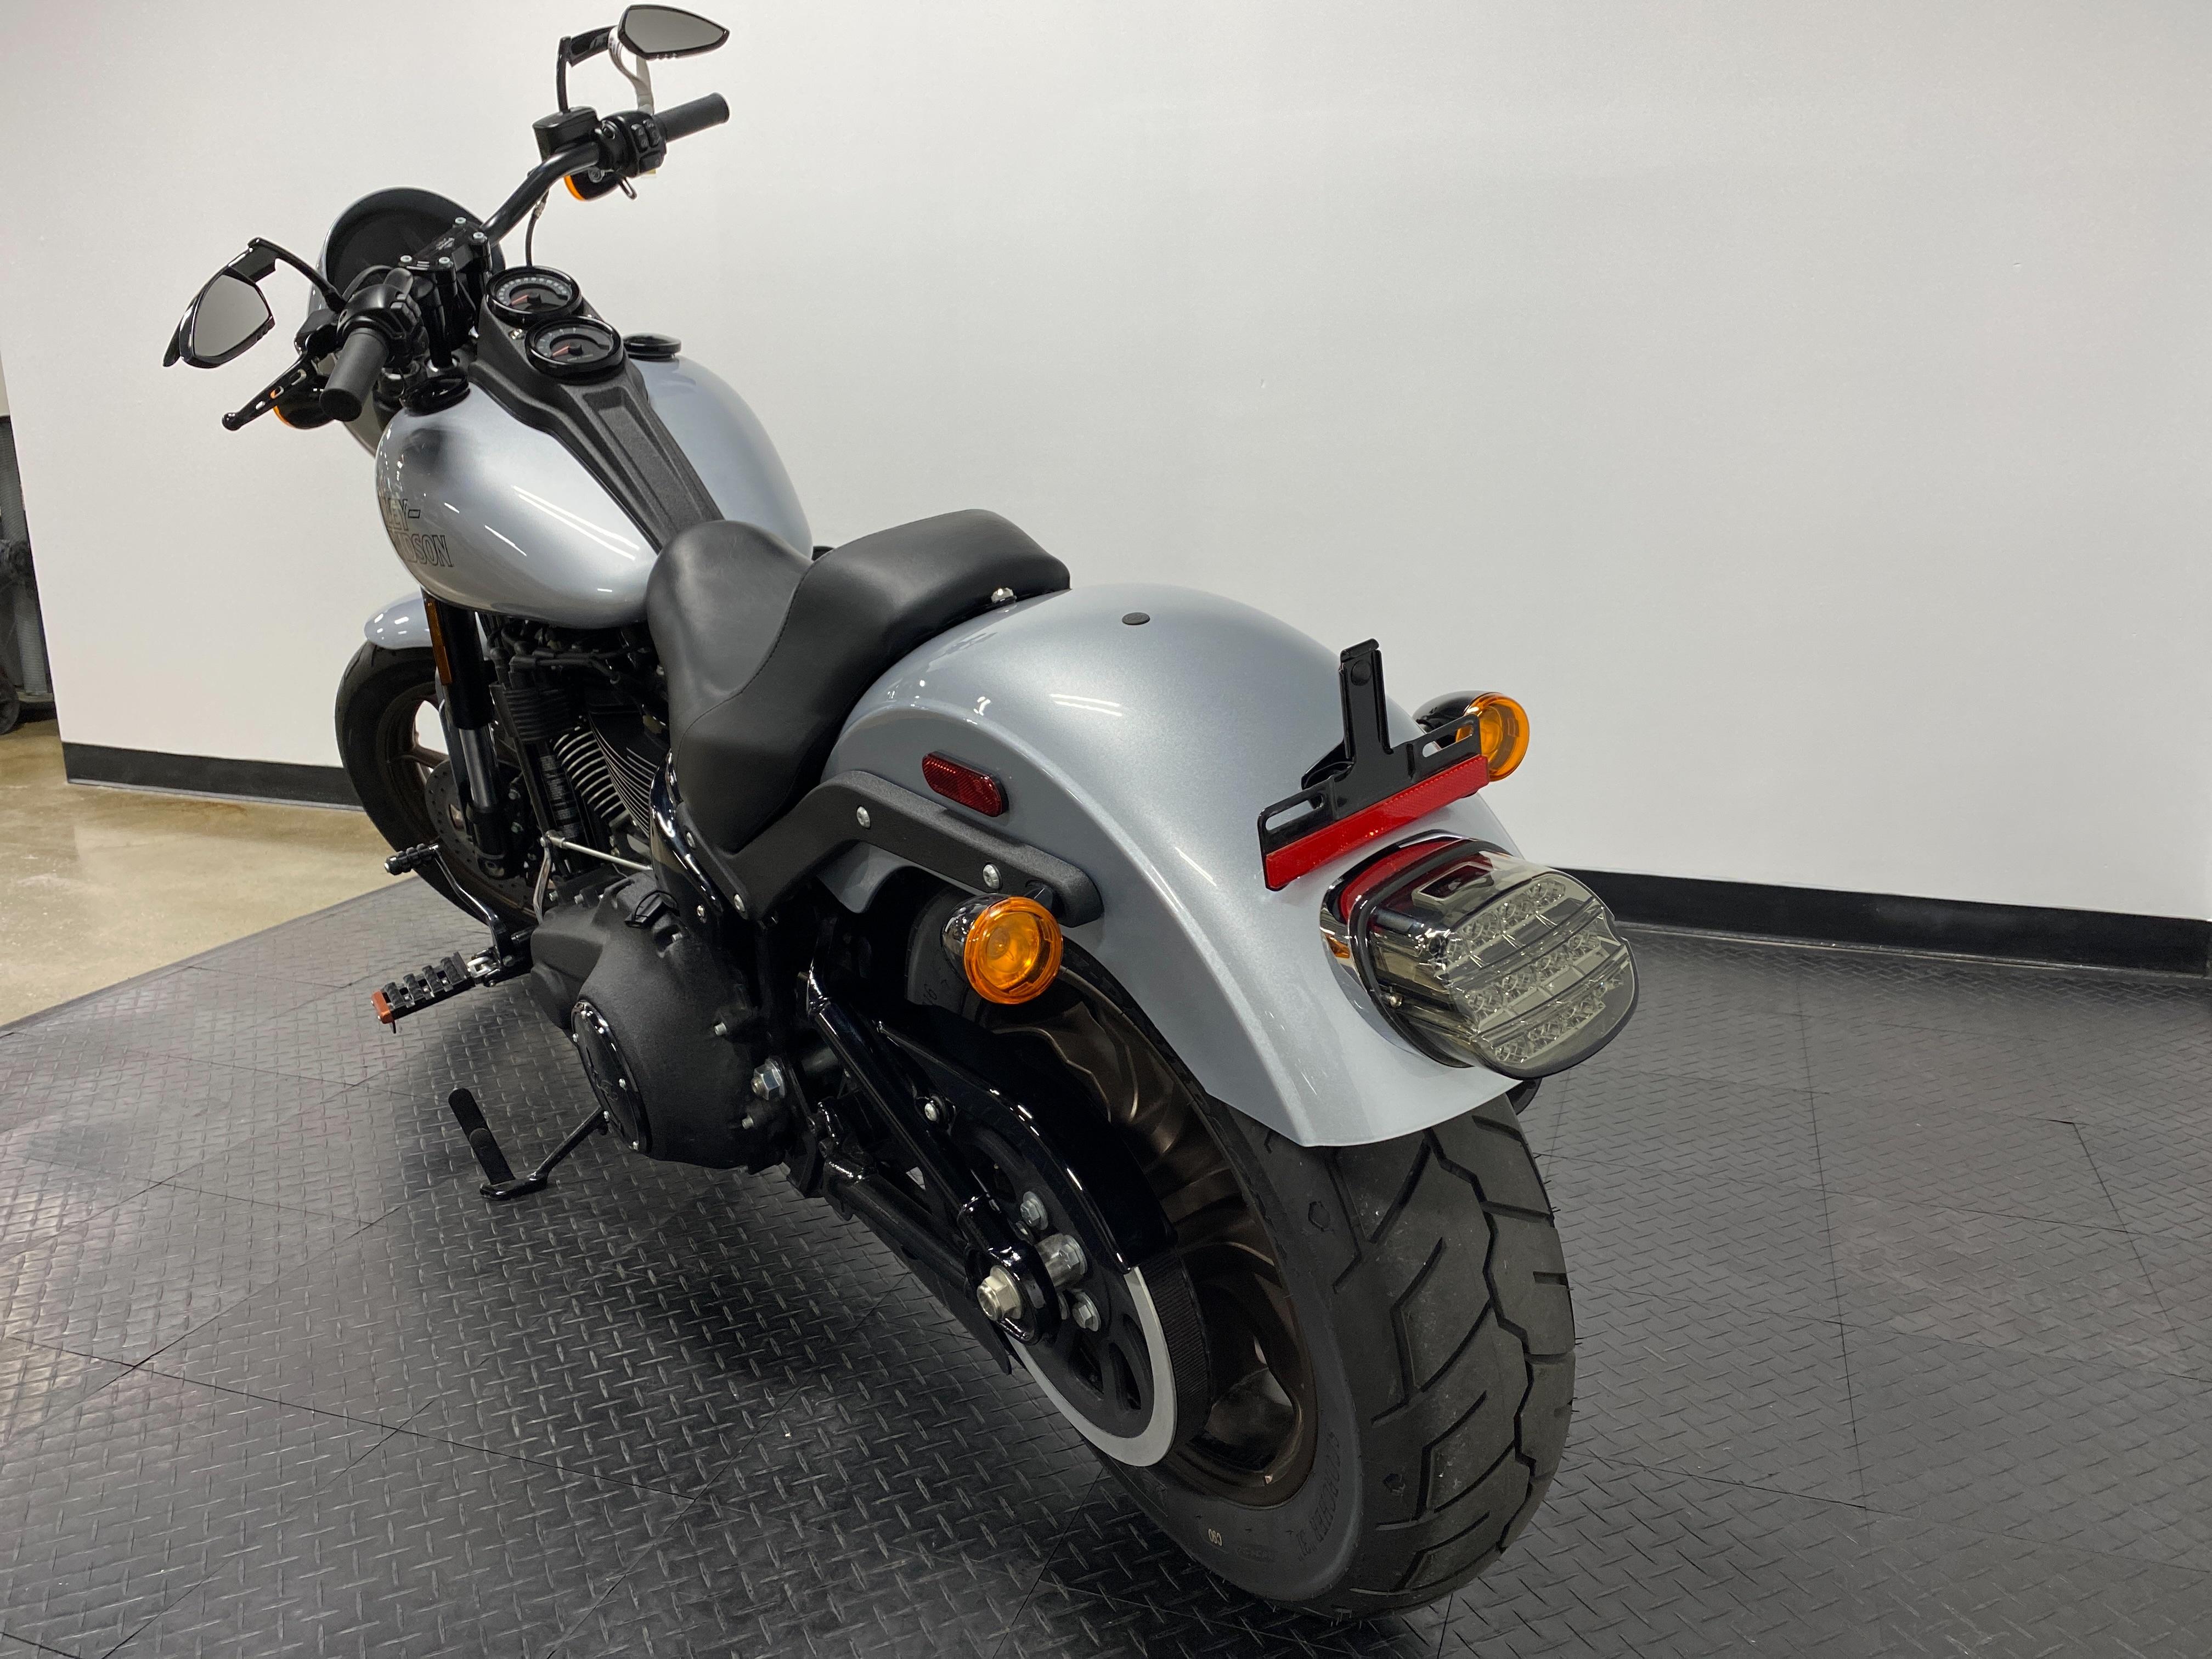 2020 Harley-Davidson Softail Low Rider S at cannonball harley-davidson